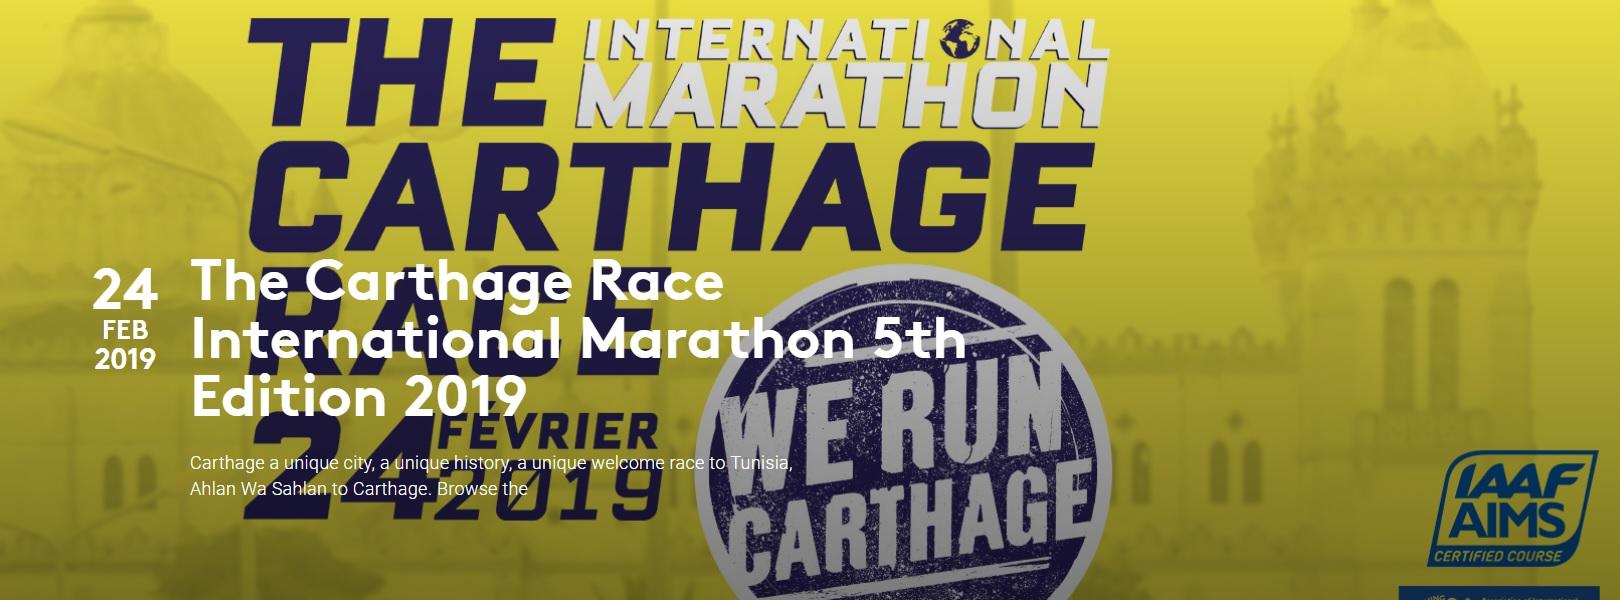 The Carthage Race International Marathon 5th Edition 2019 - Race Connections